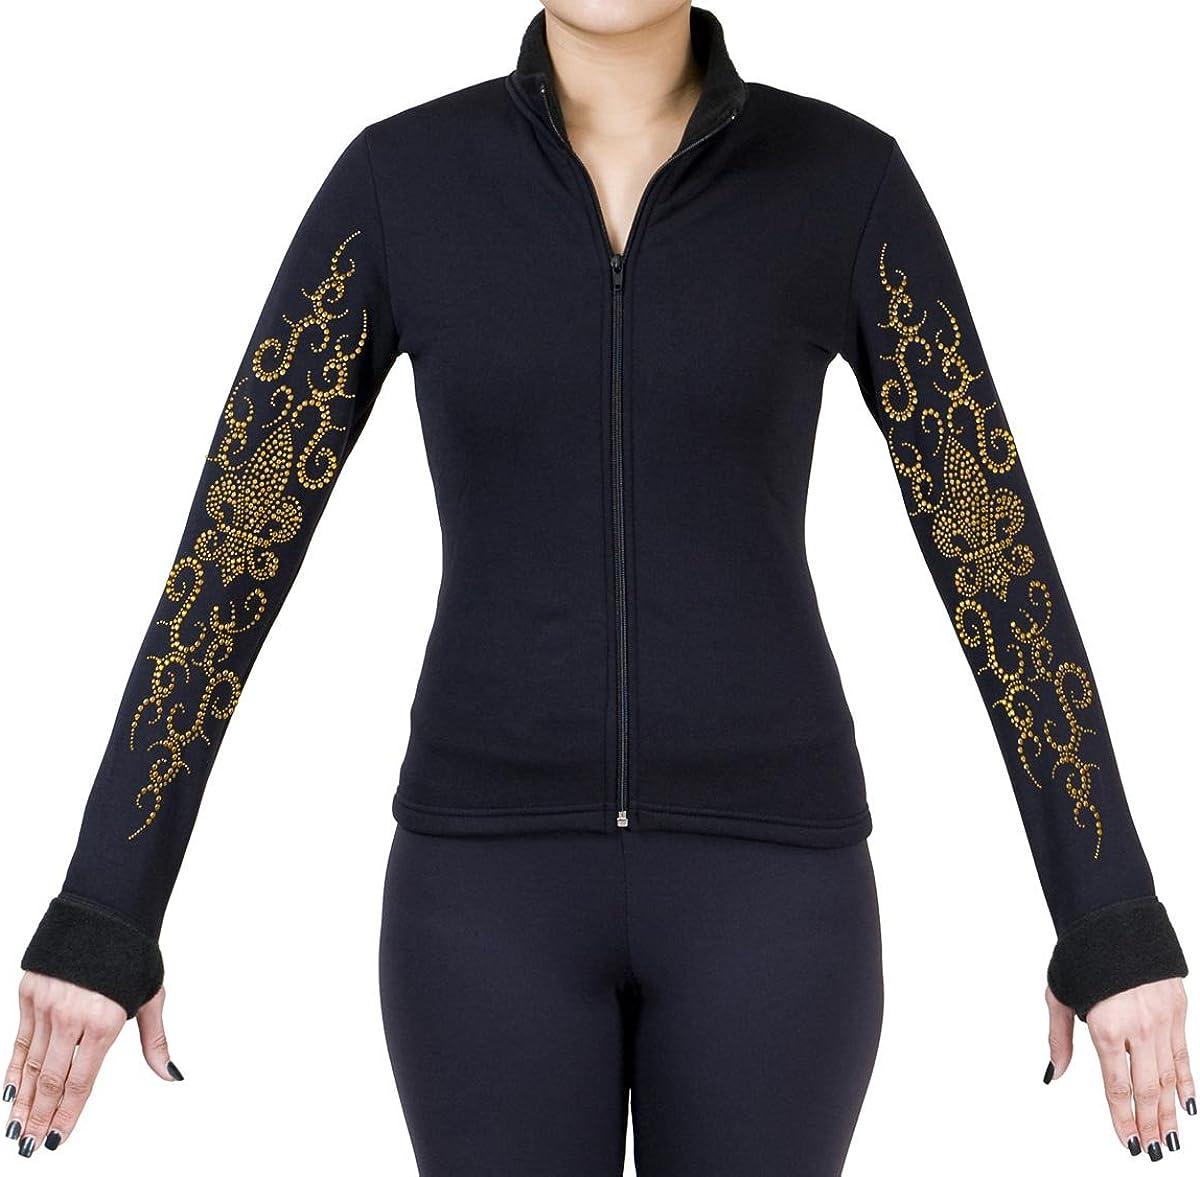 Purchase ny2 Sportswear Figure Skating Polartec Jacket Polar with Max 85% OFF Fleece